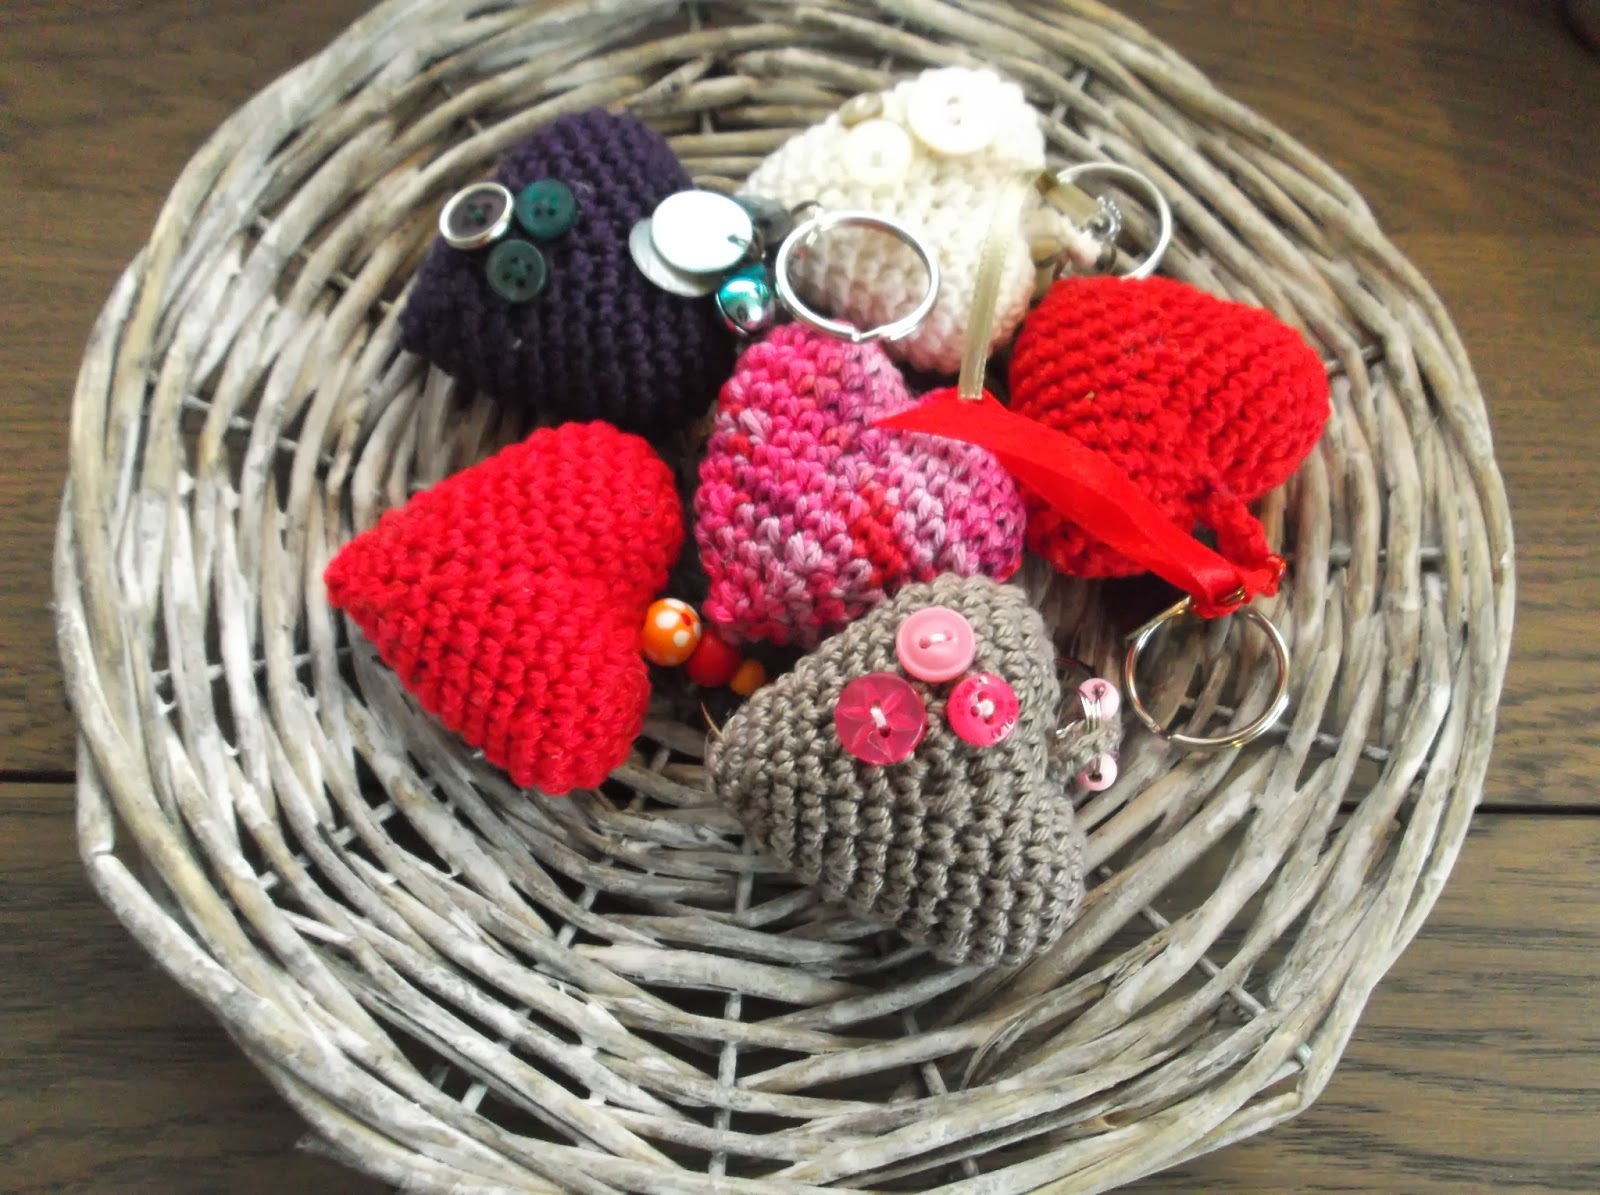 Haakydee Unieke Hartjes Sleutelhangers Unique Crocheted Heart Key